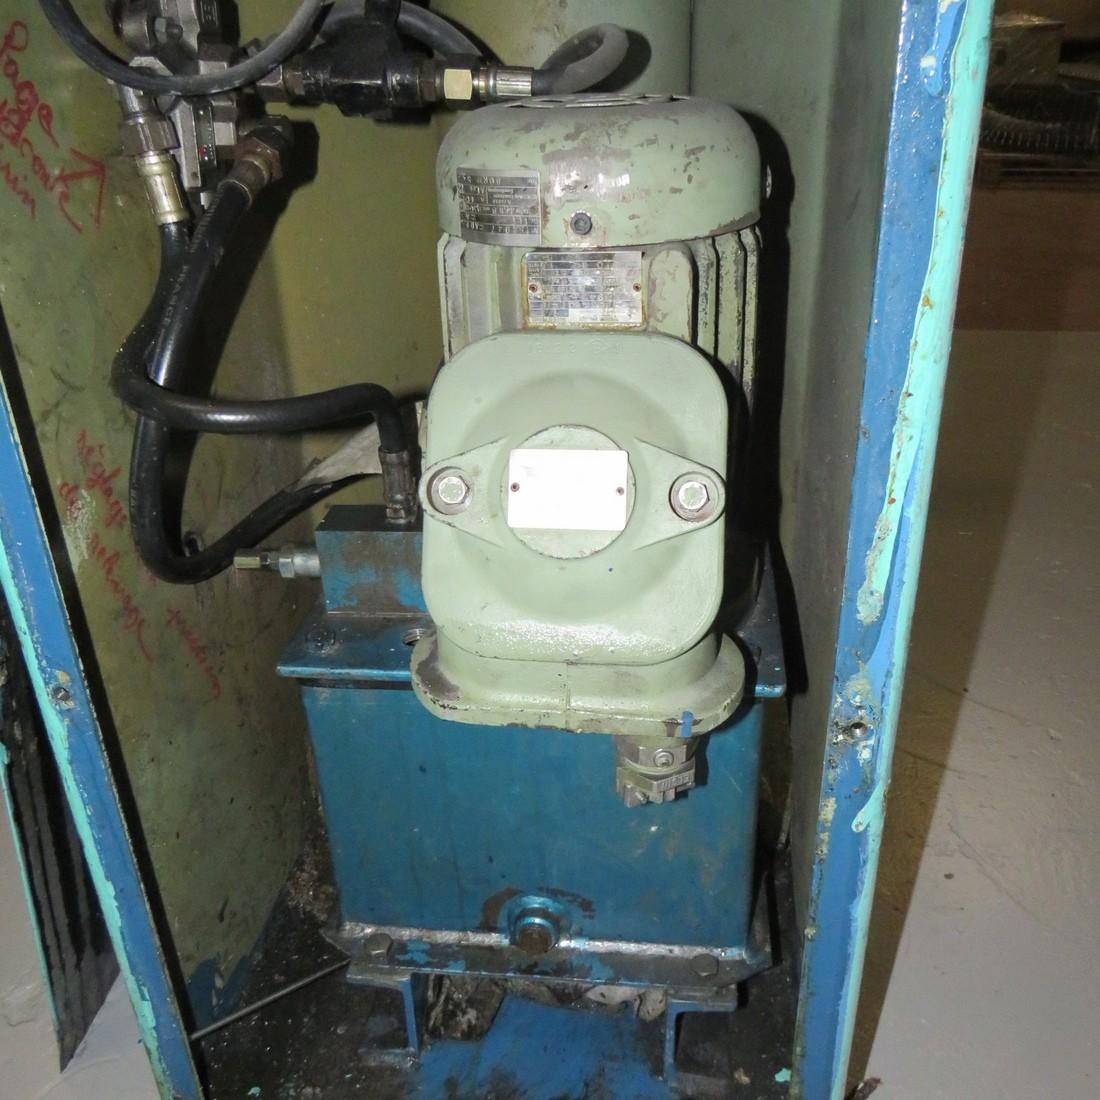 R6T1291- EURO-MACHINES Stainless Steel Disperser